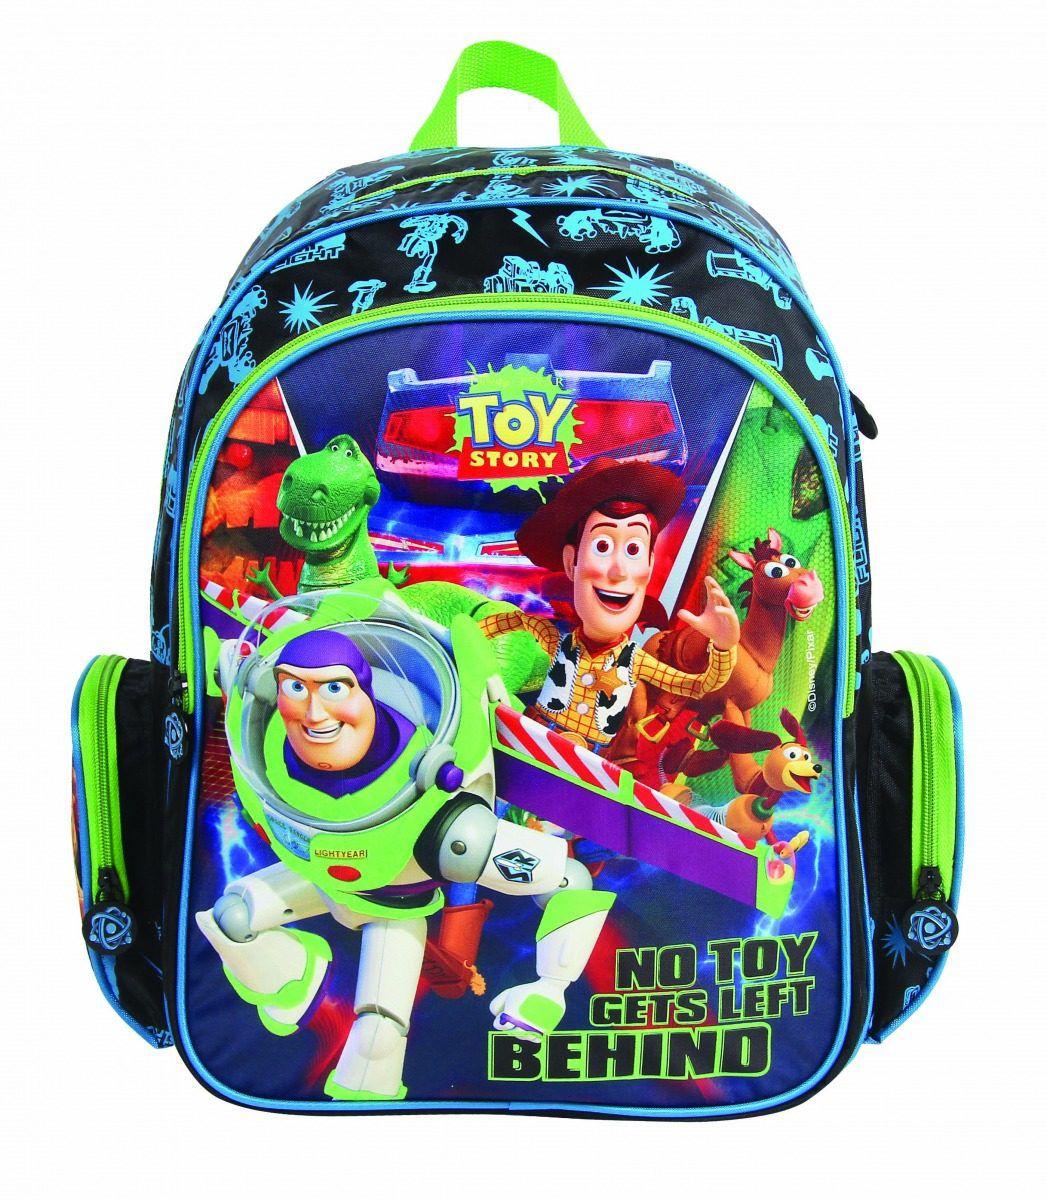 Mochila G Toy Story Fosforescente 30445 Dermiwil